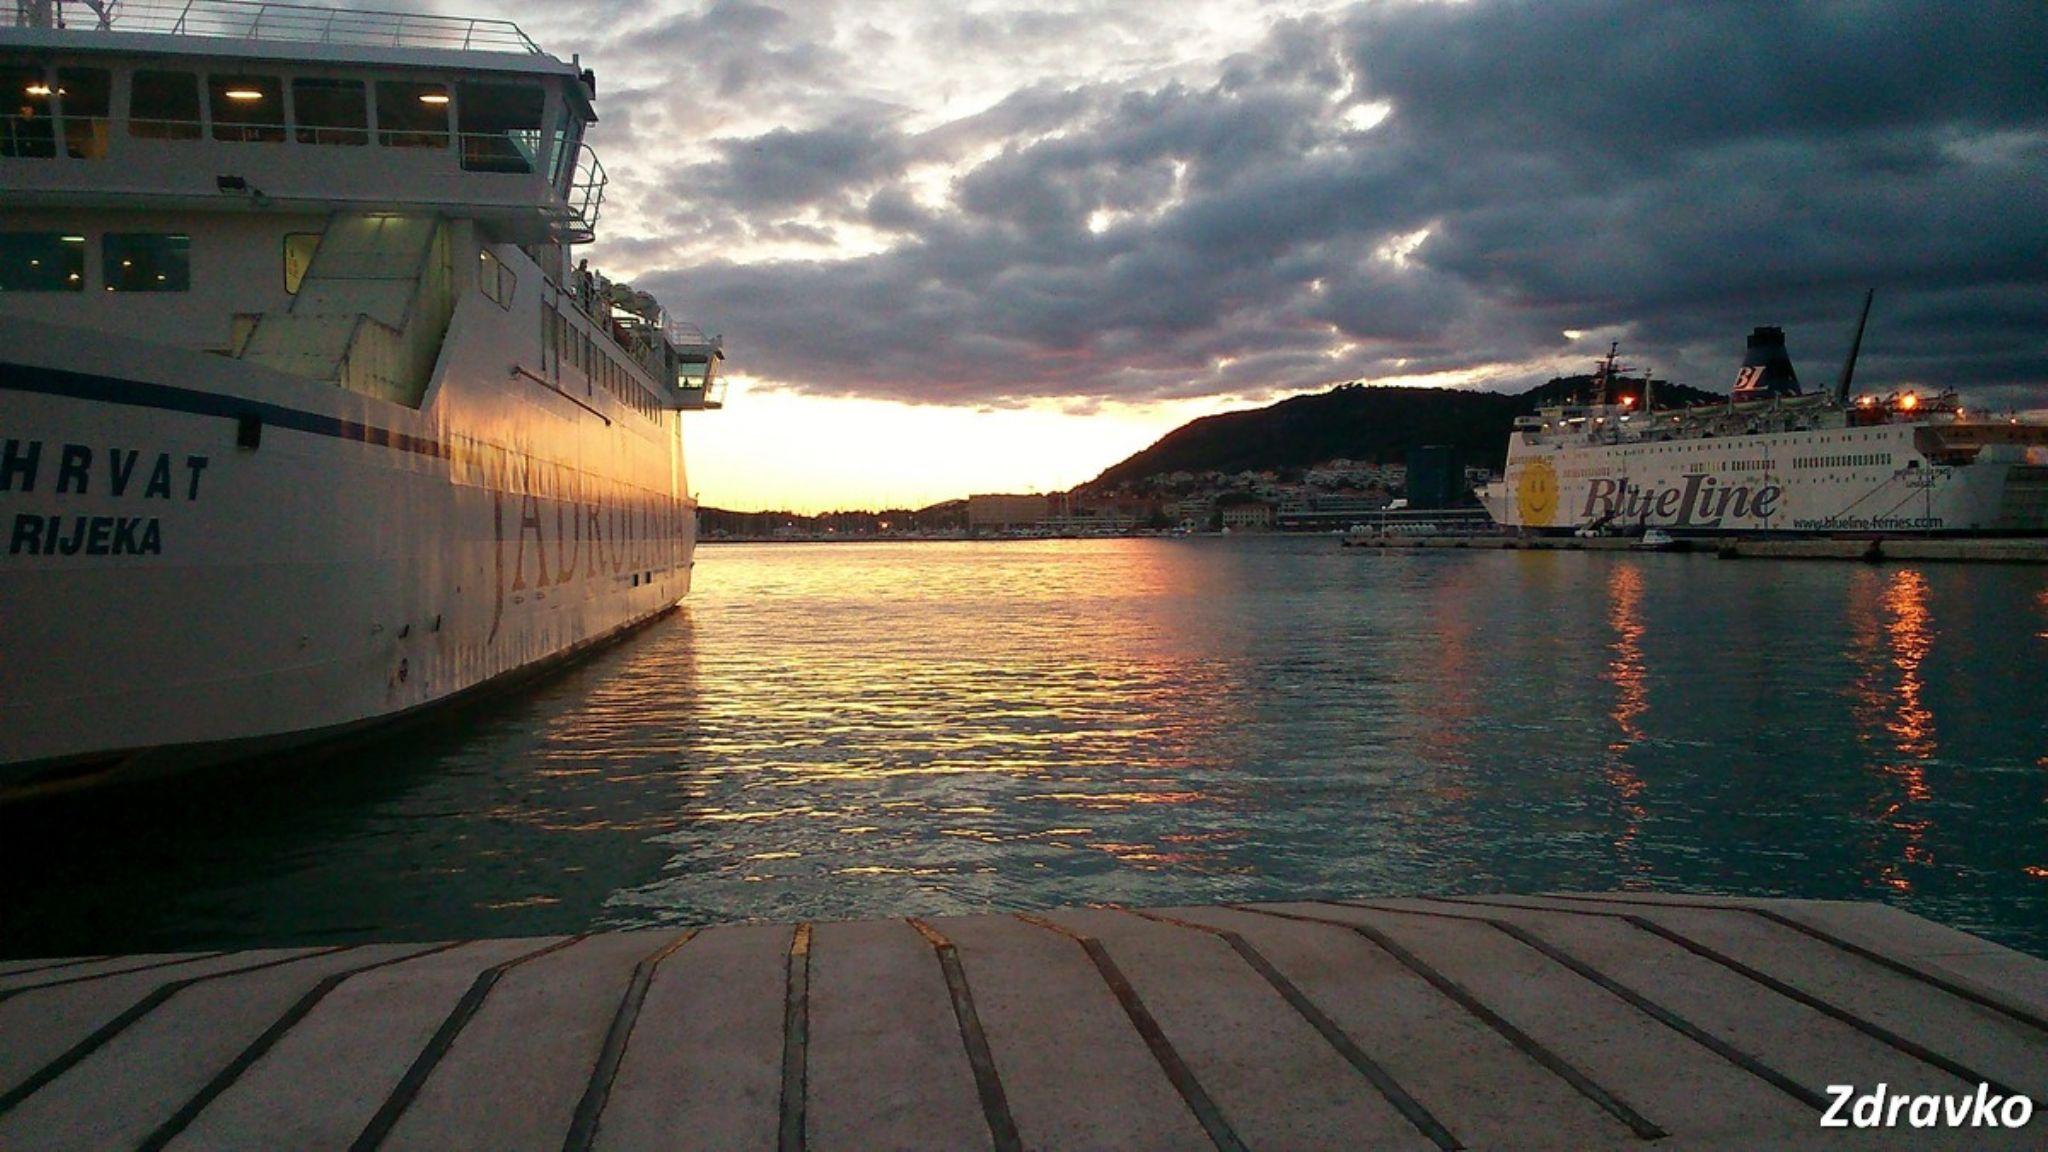 Sunset. The ferry port of Split, Croatia. by ZdravkoRadovnikovic